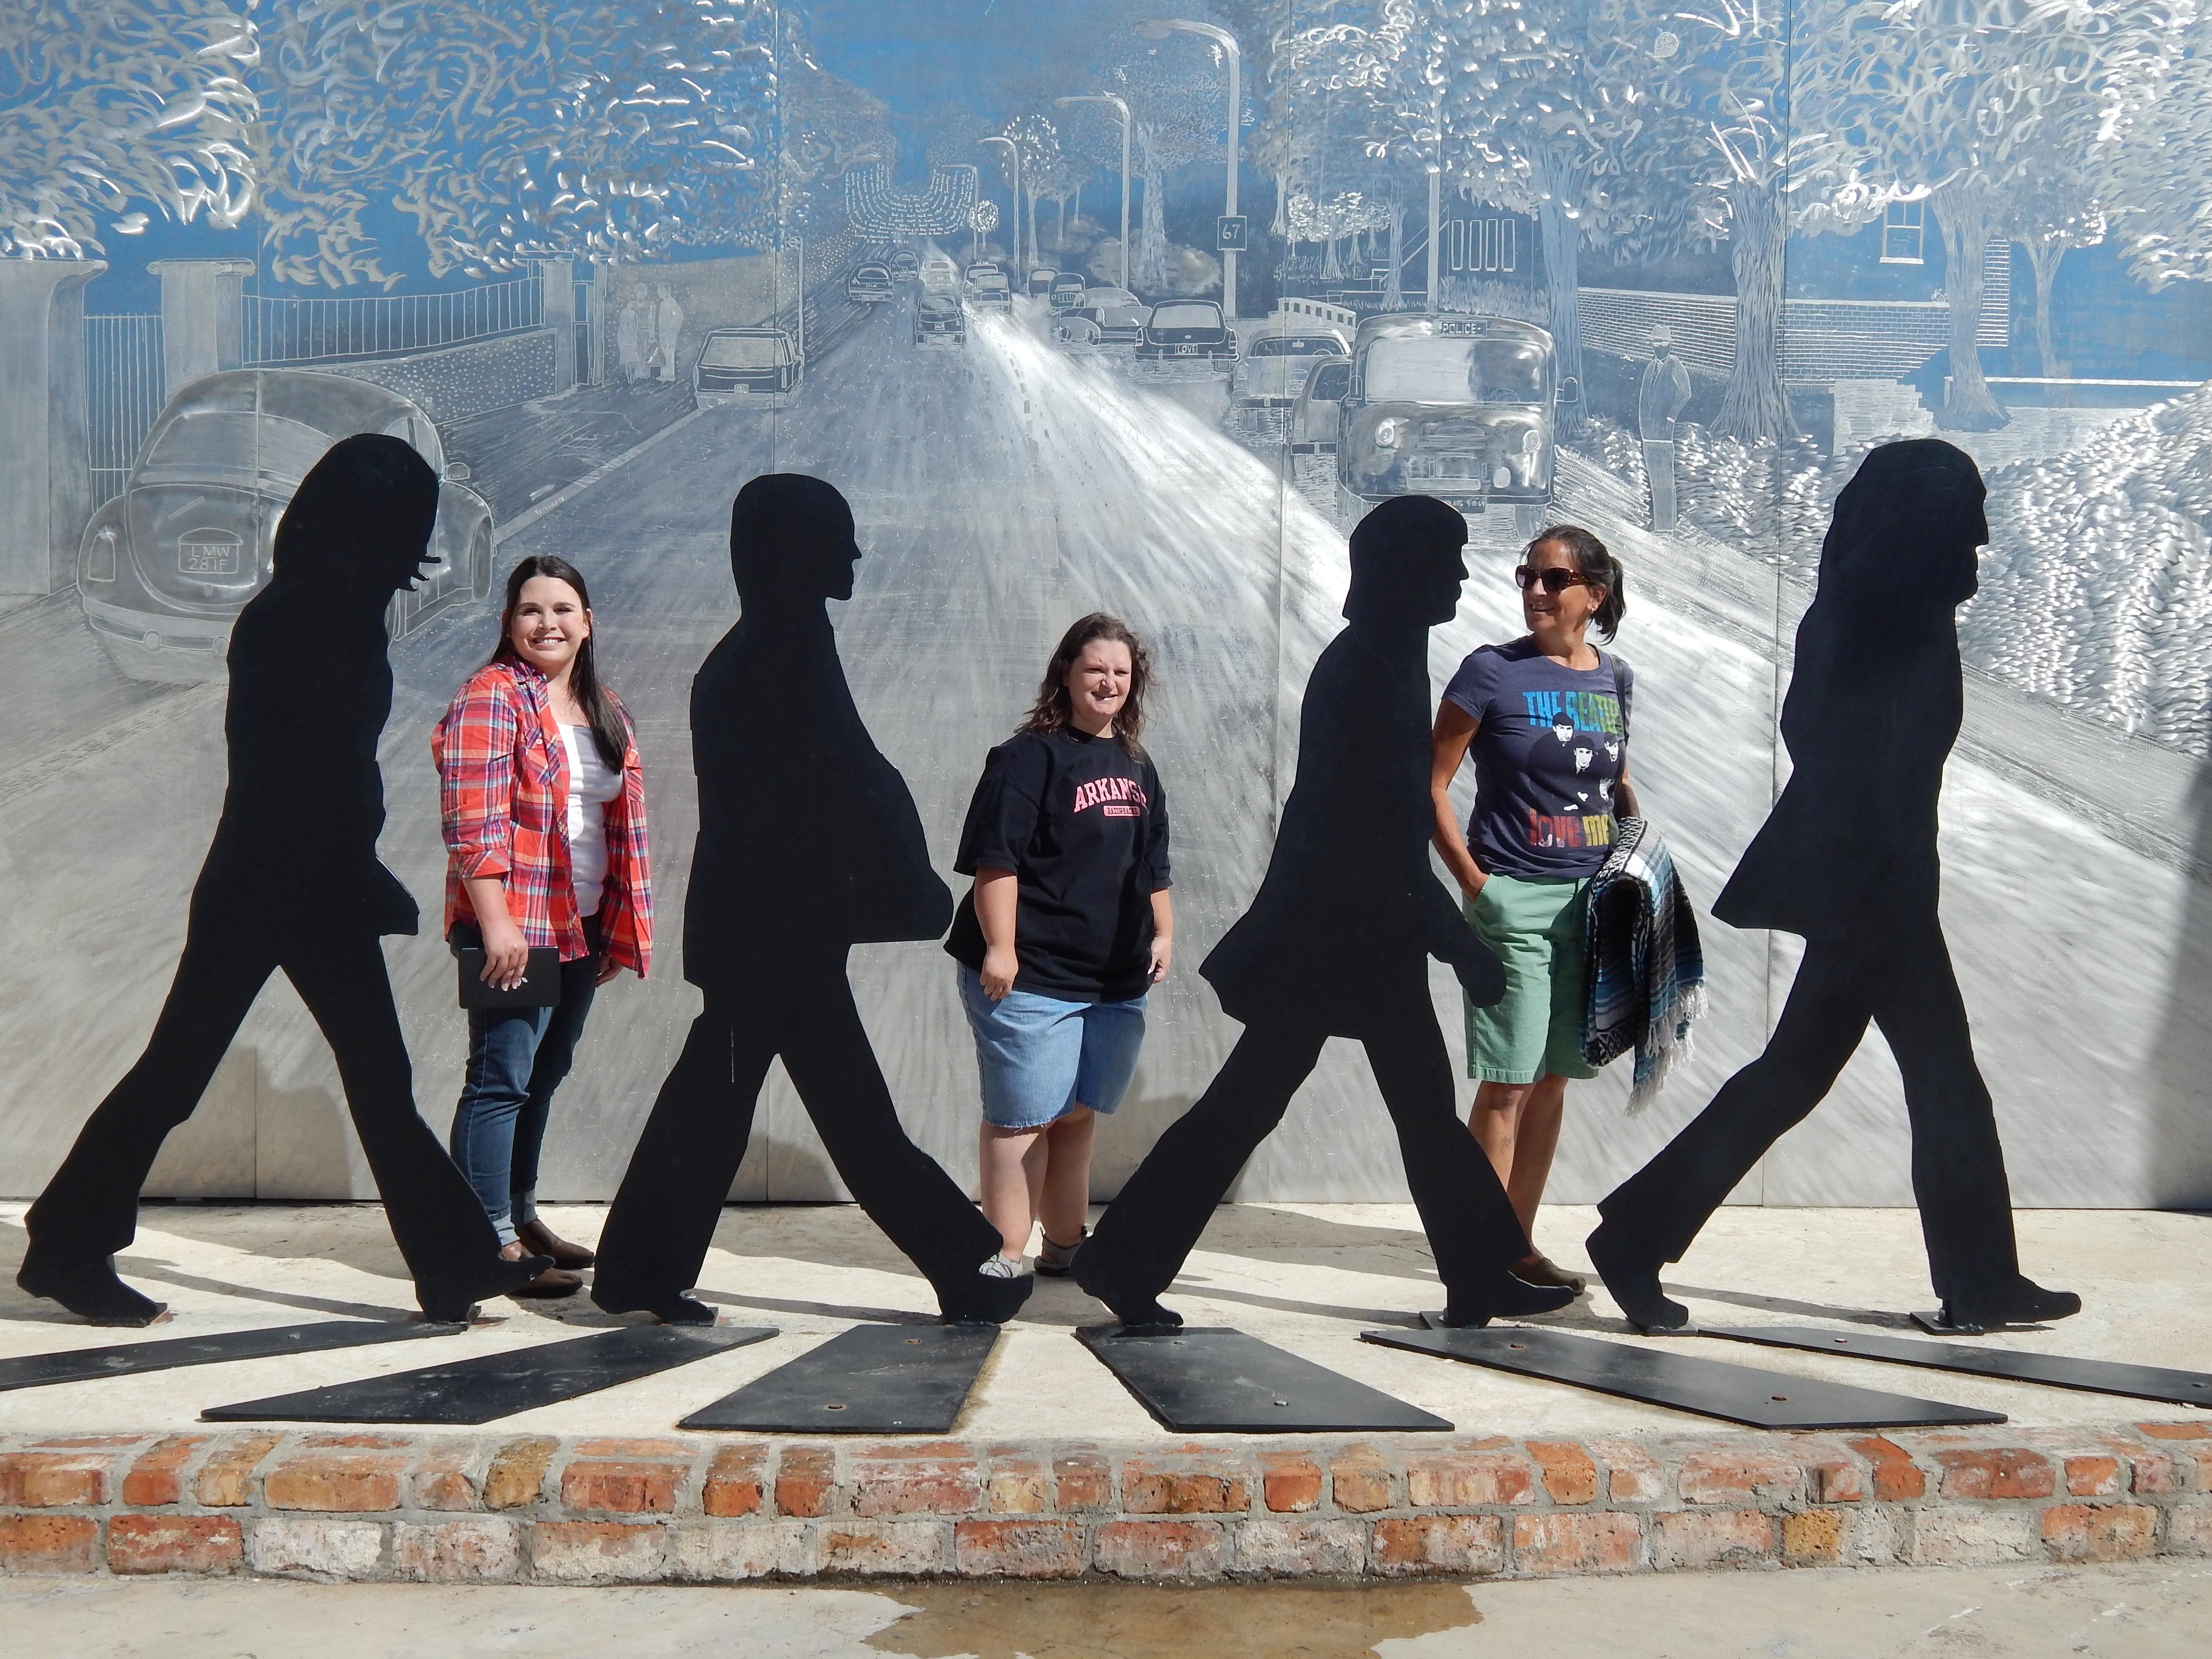 Beatles_Statue